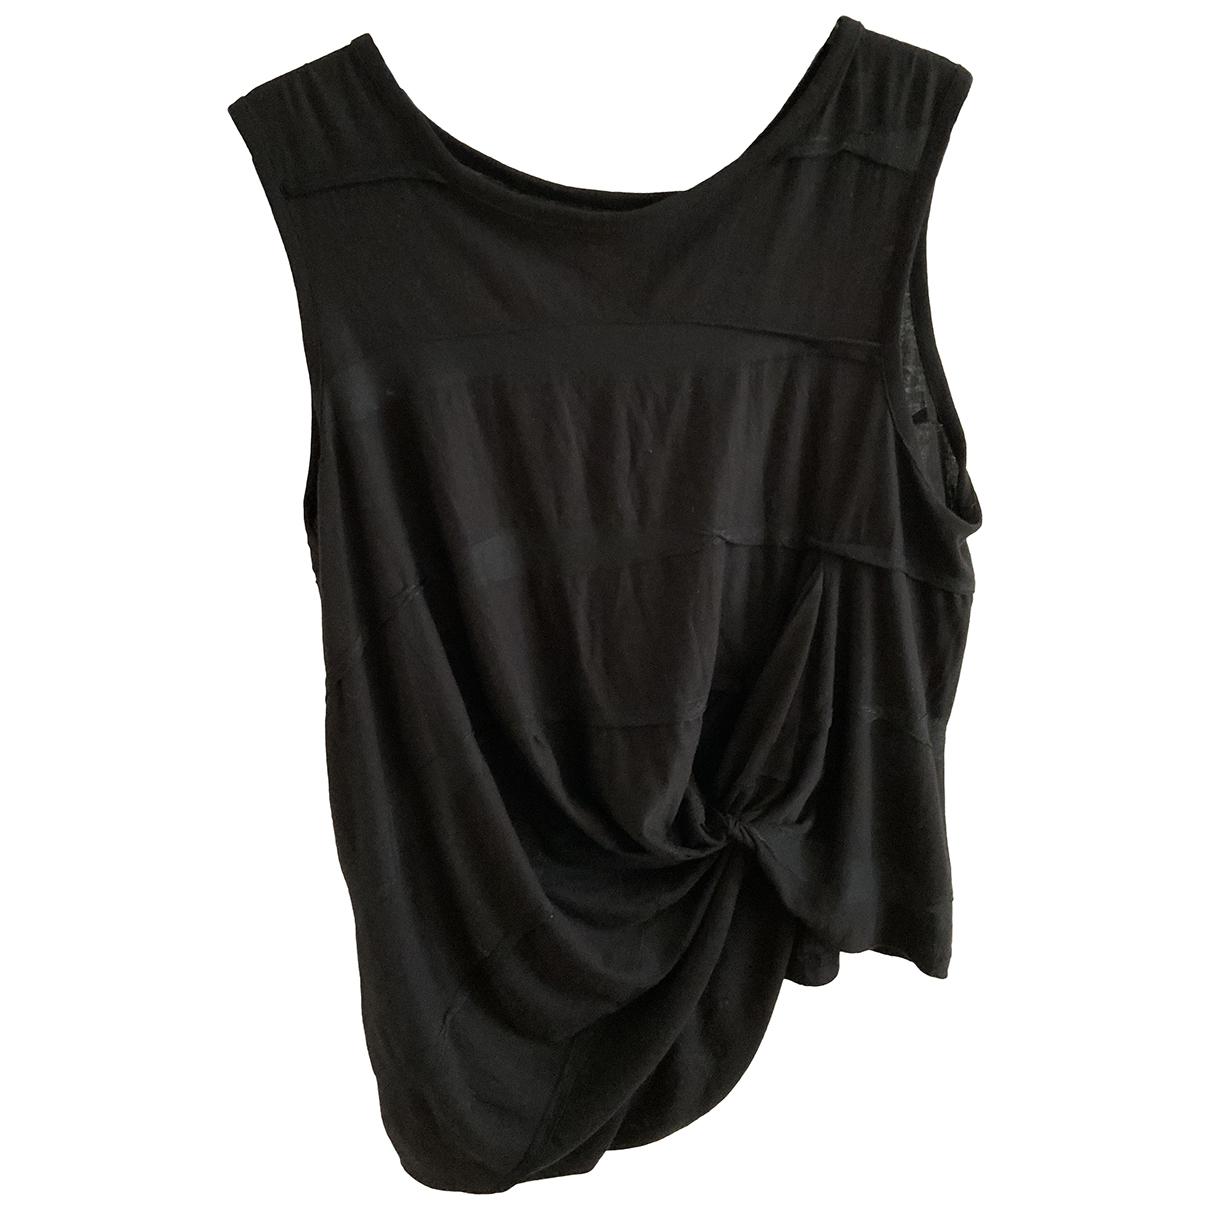 Yohji Yamamoto \N Black Cotton  top for Women 2 0-5